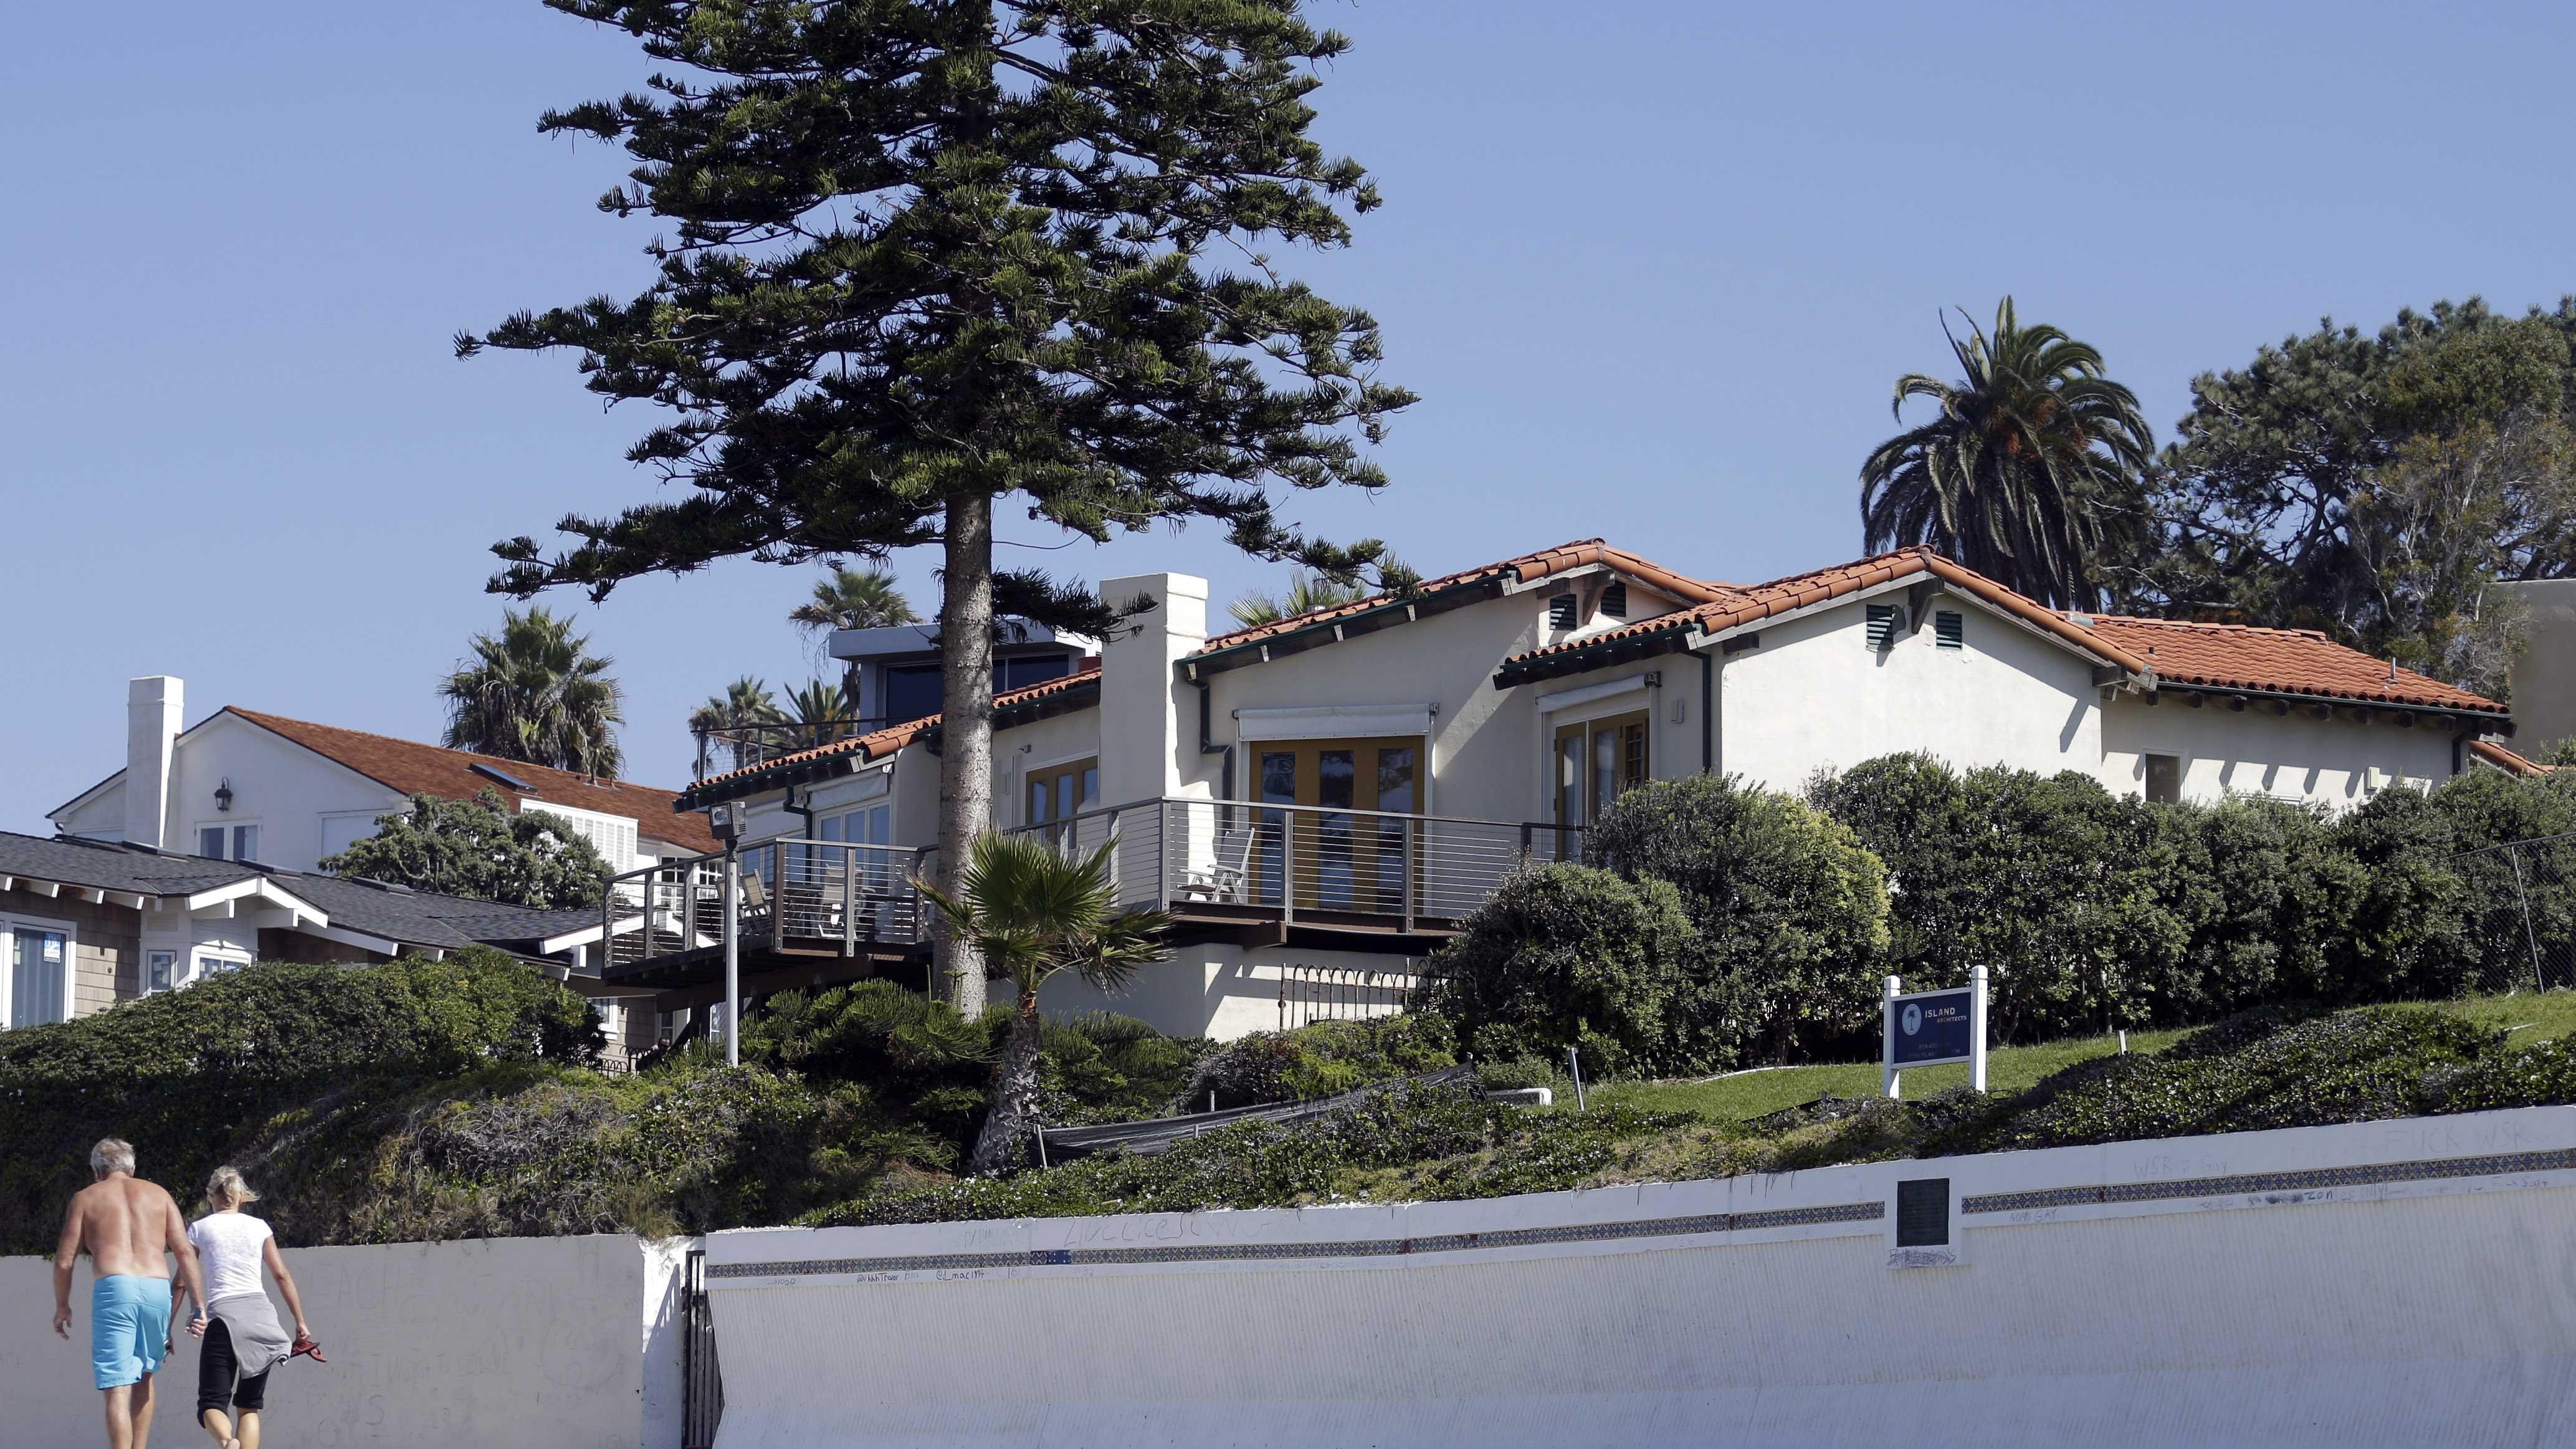 Romney La Jolla San Diego home 101213